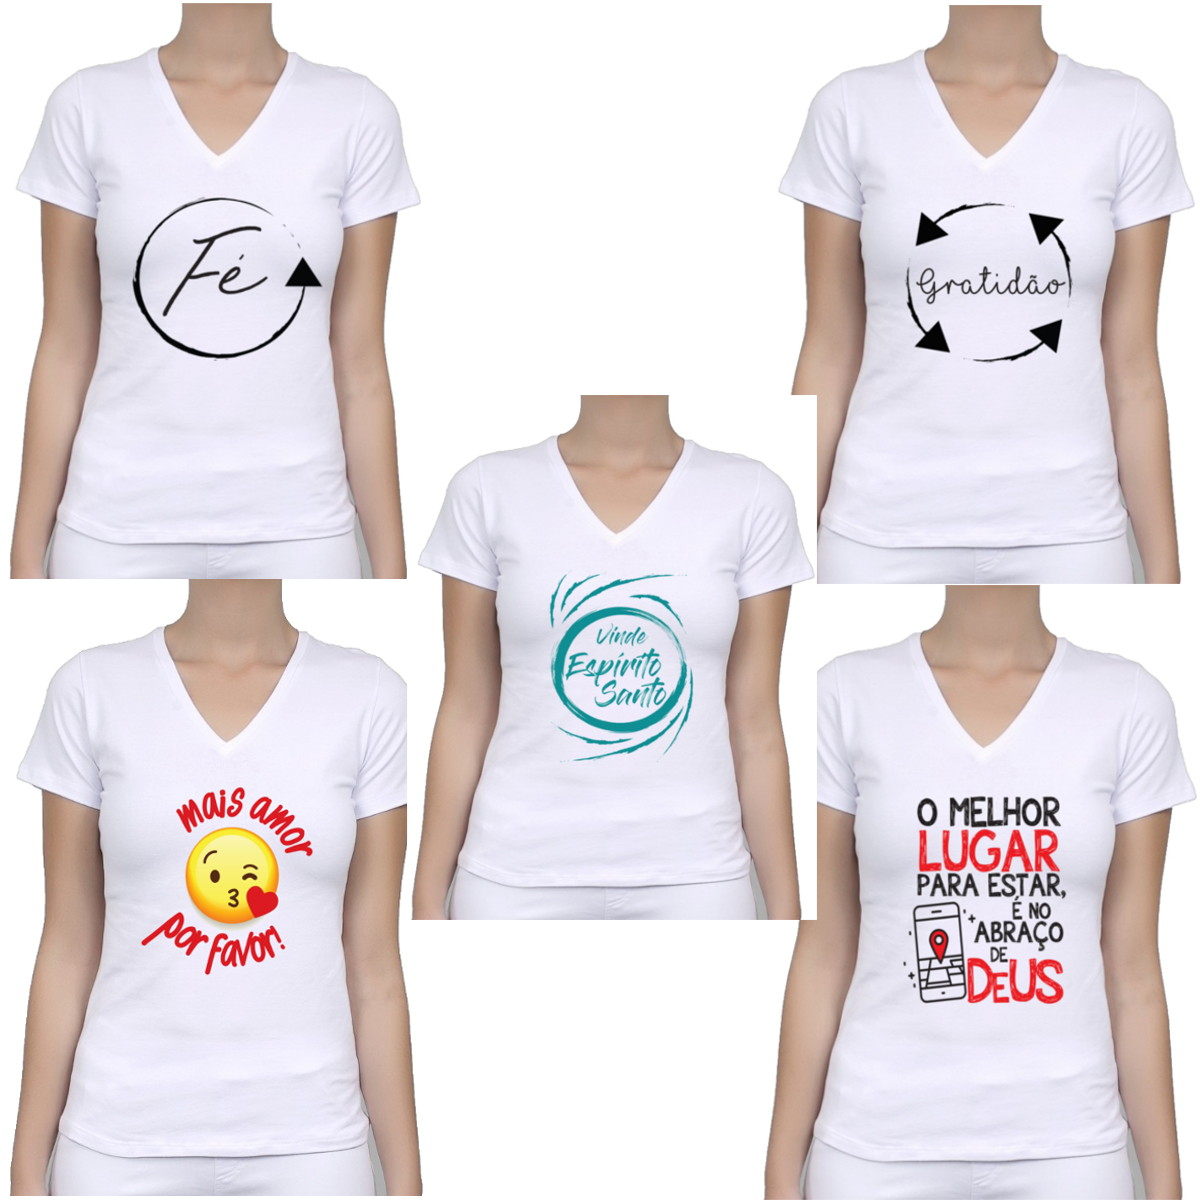 75d71f7df Kit 5 Camiseta Baby Look Feminino Gospel Fé Atacado no Elo7 ...